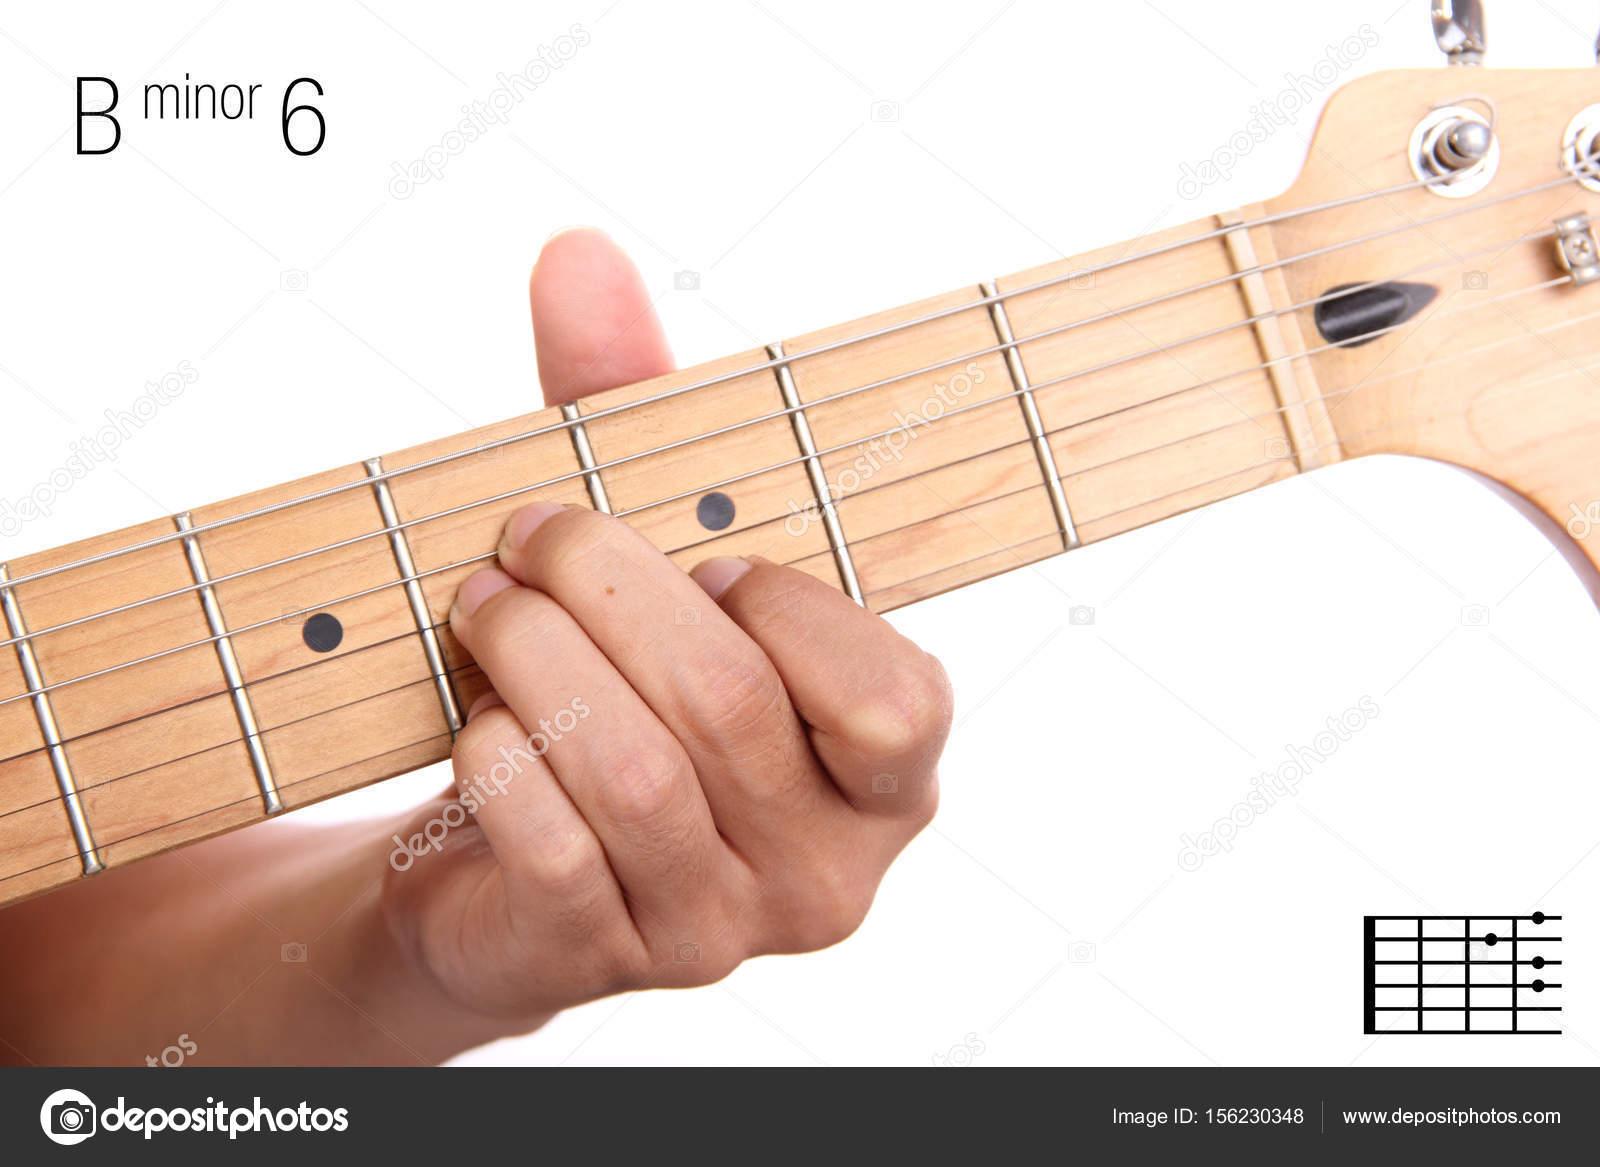 B Minor Guitar Chord Bm6 Guitar Chord Tutorial Stock Photo Pepscostudio 156230348